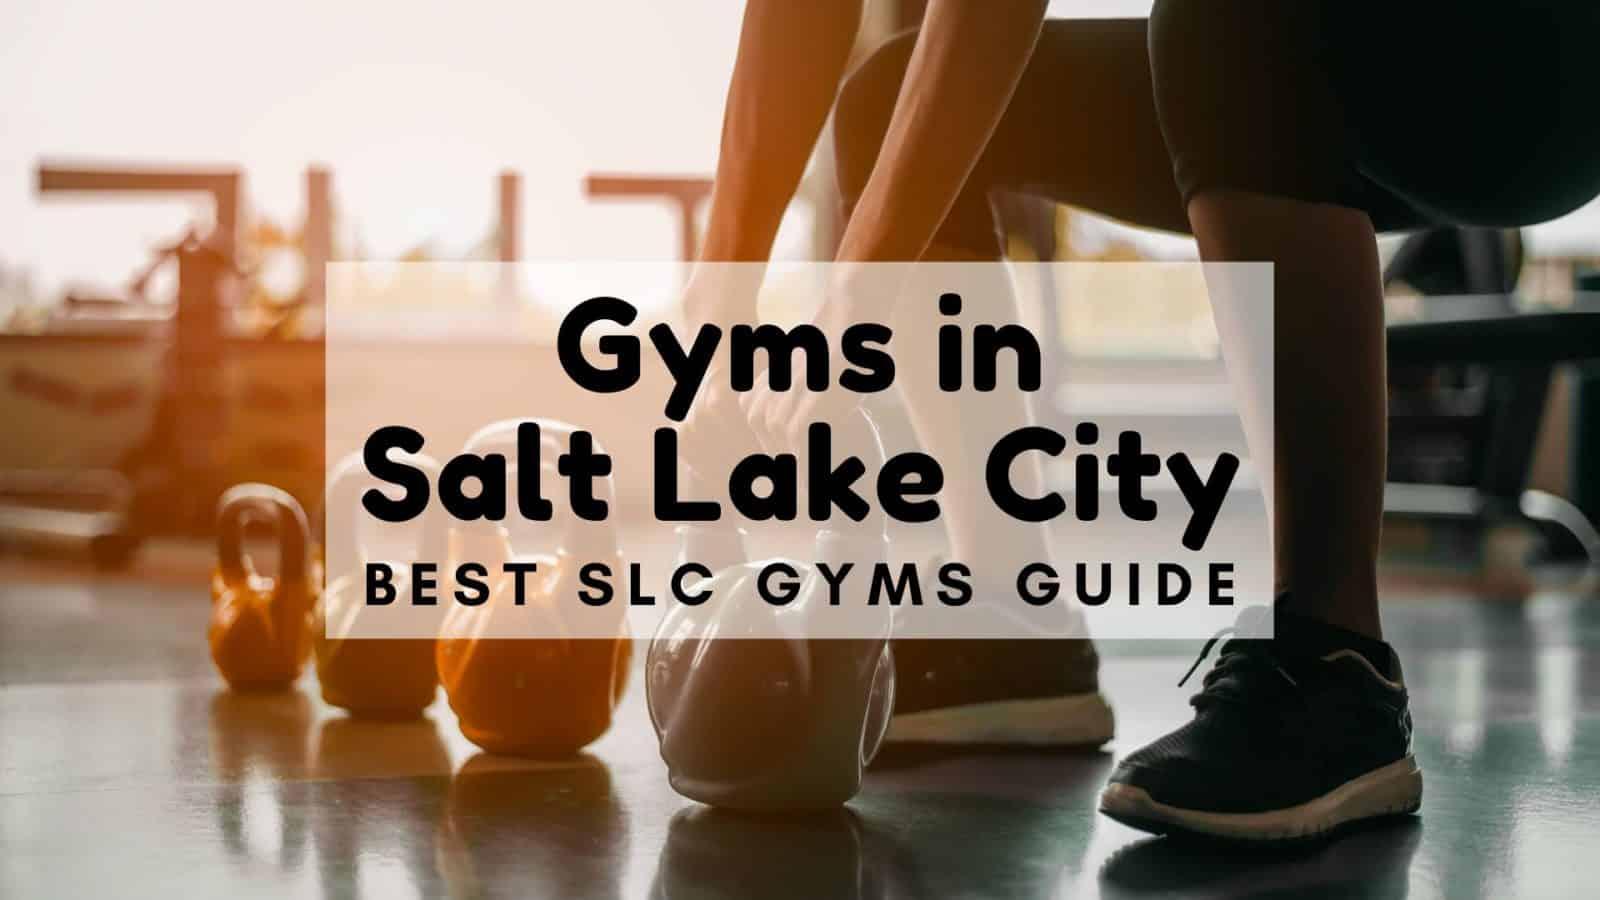 Gyms in Salt Lake City - Best SLC Gyms Guide